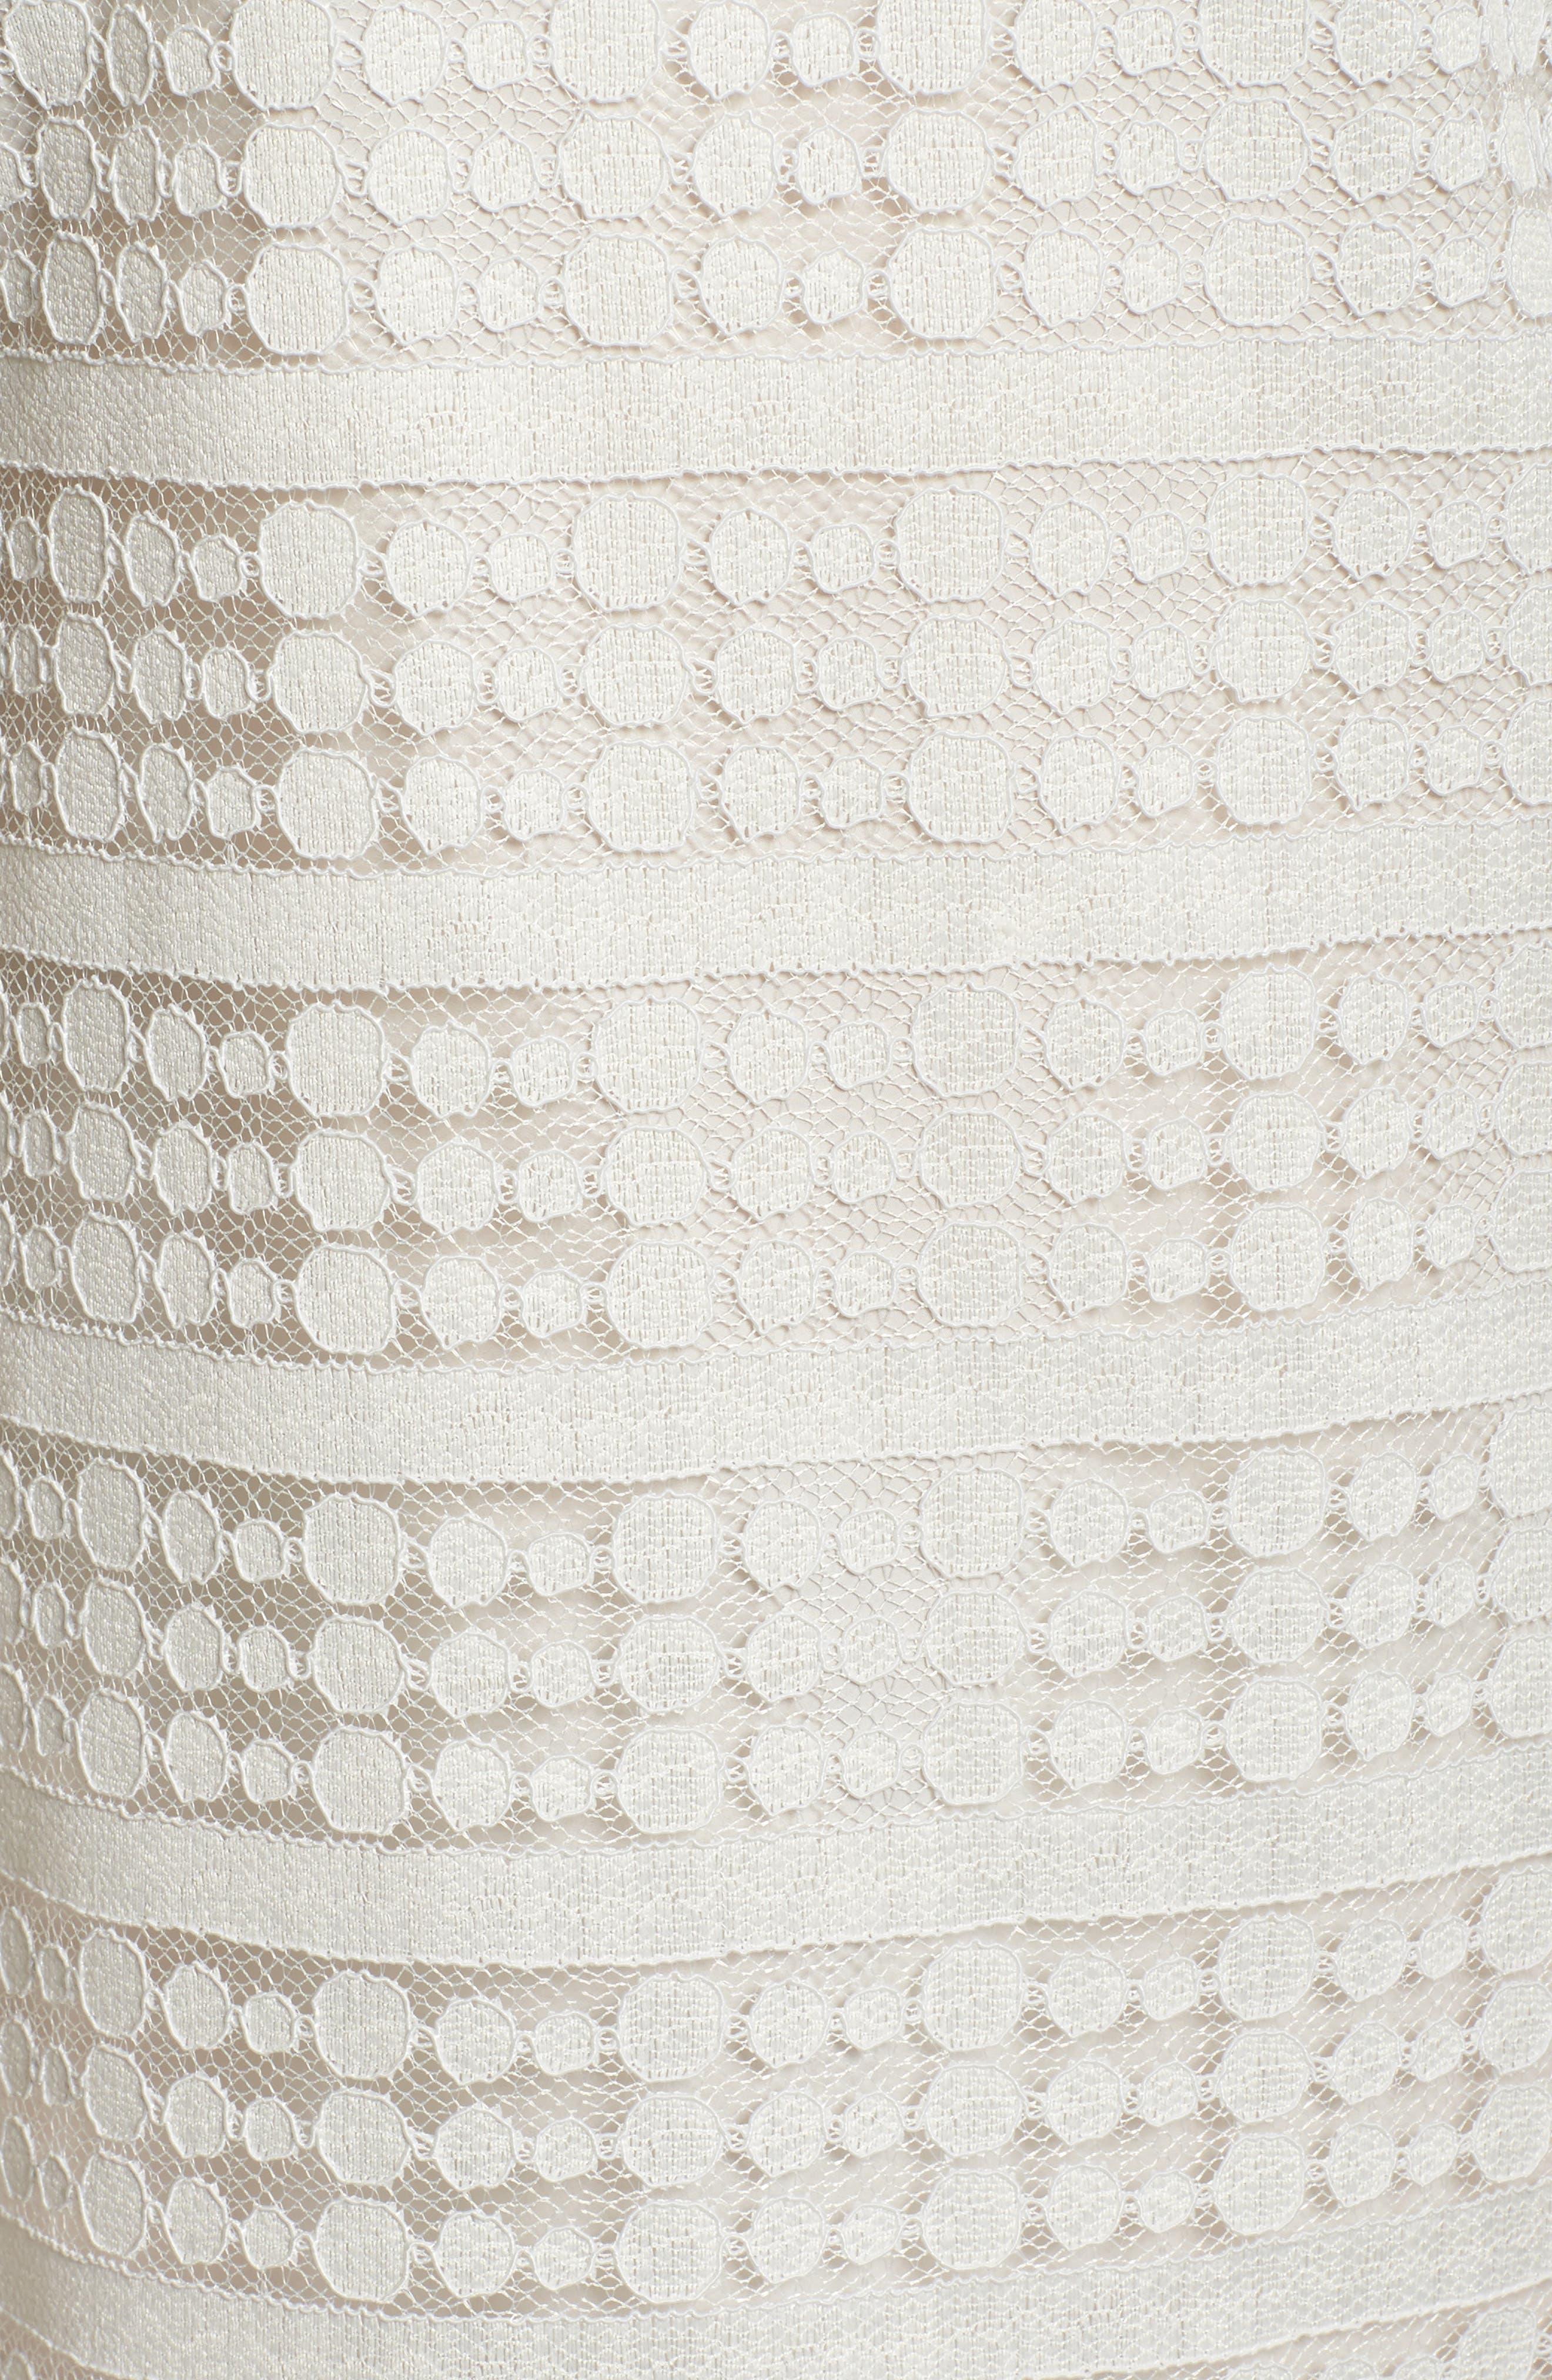 Merengue Off the Shoulder Minidress,                             Alternate thumbnail 5, color,                             White